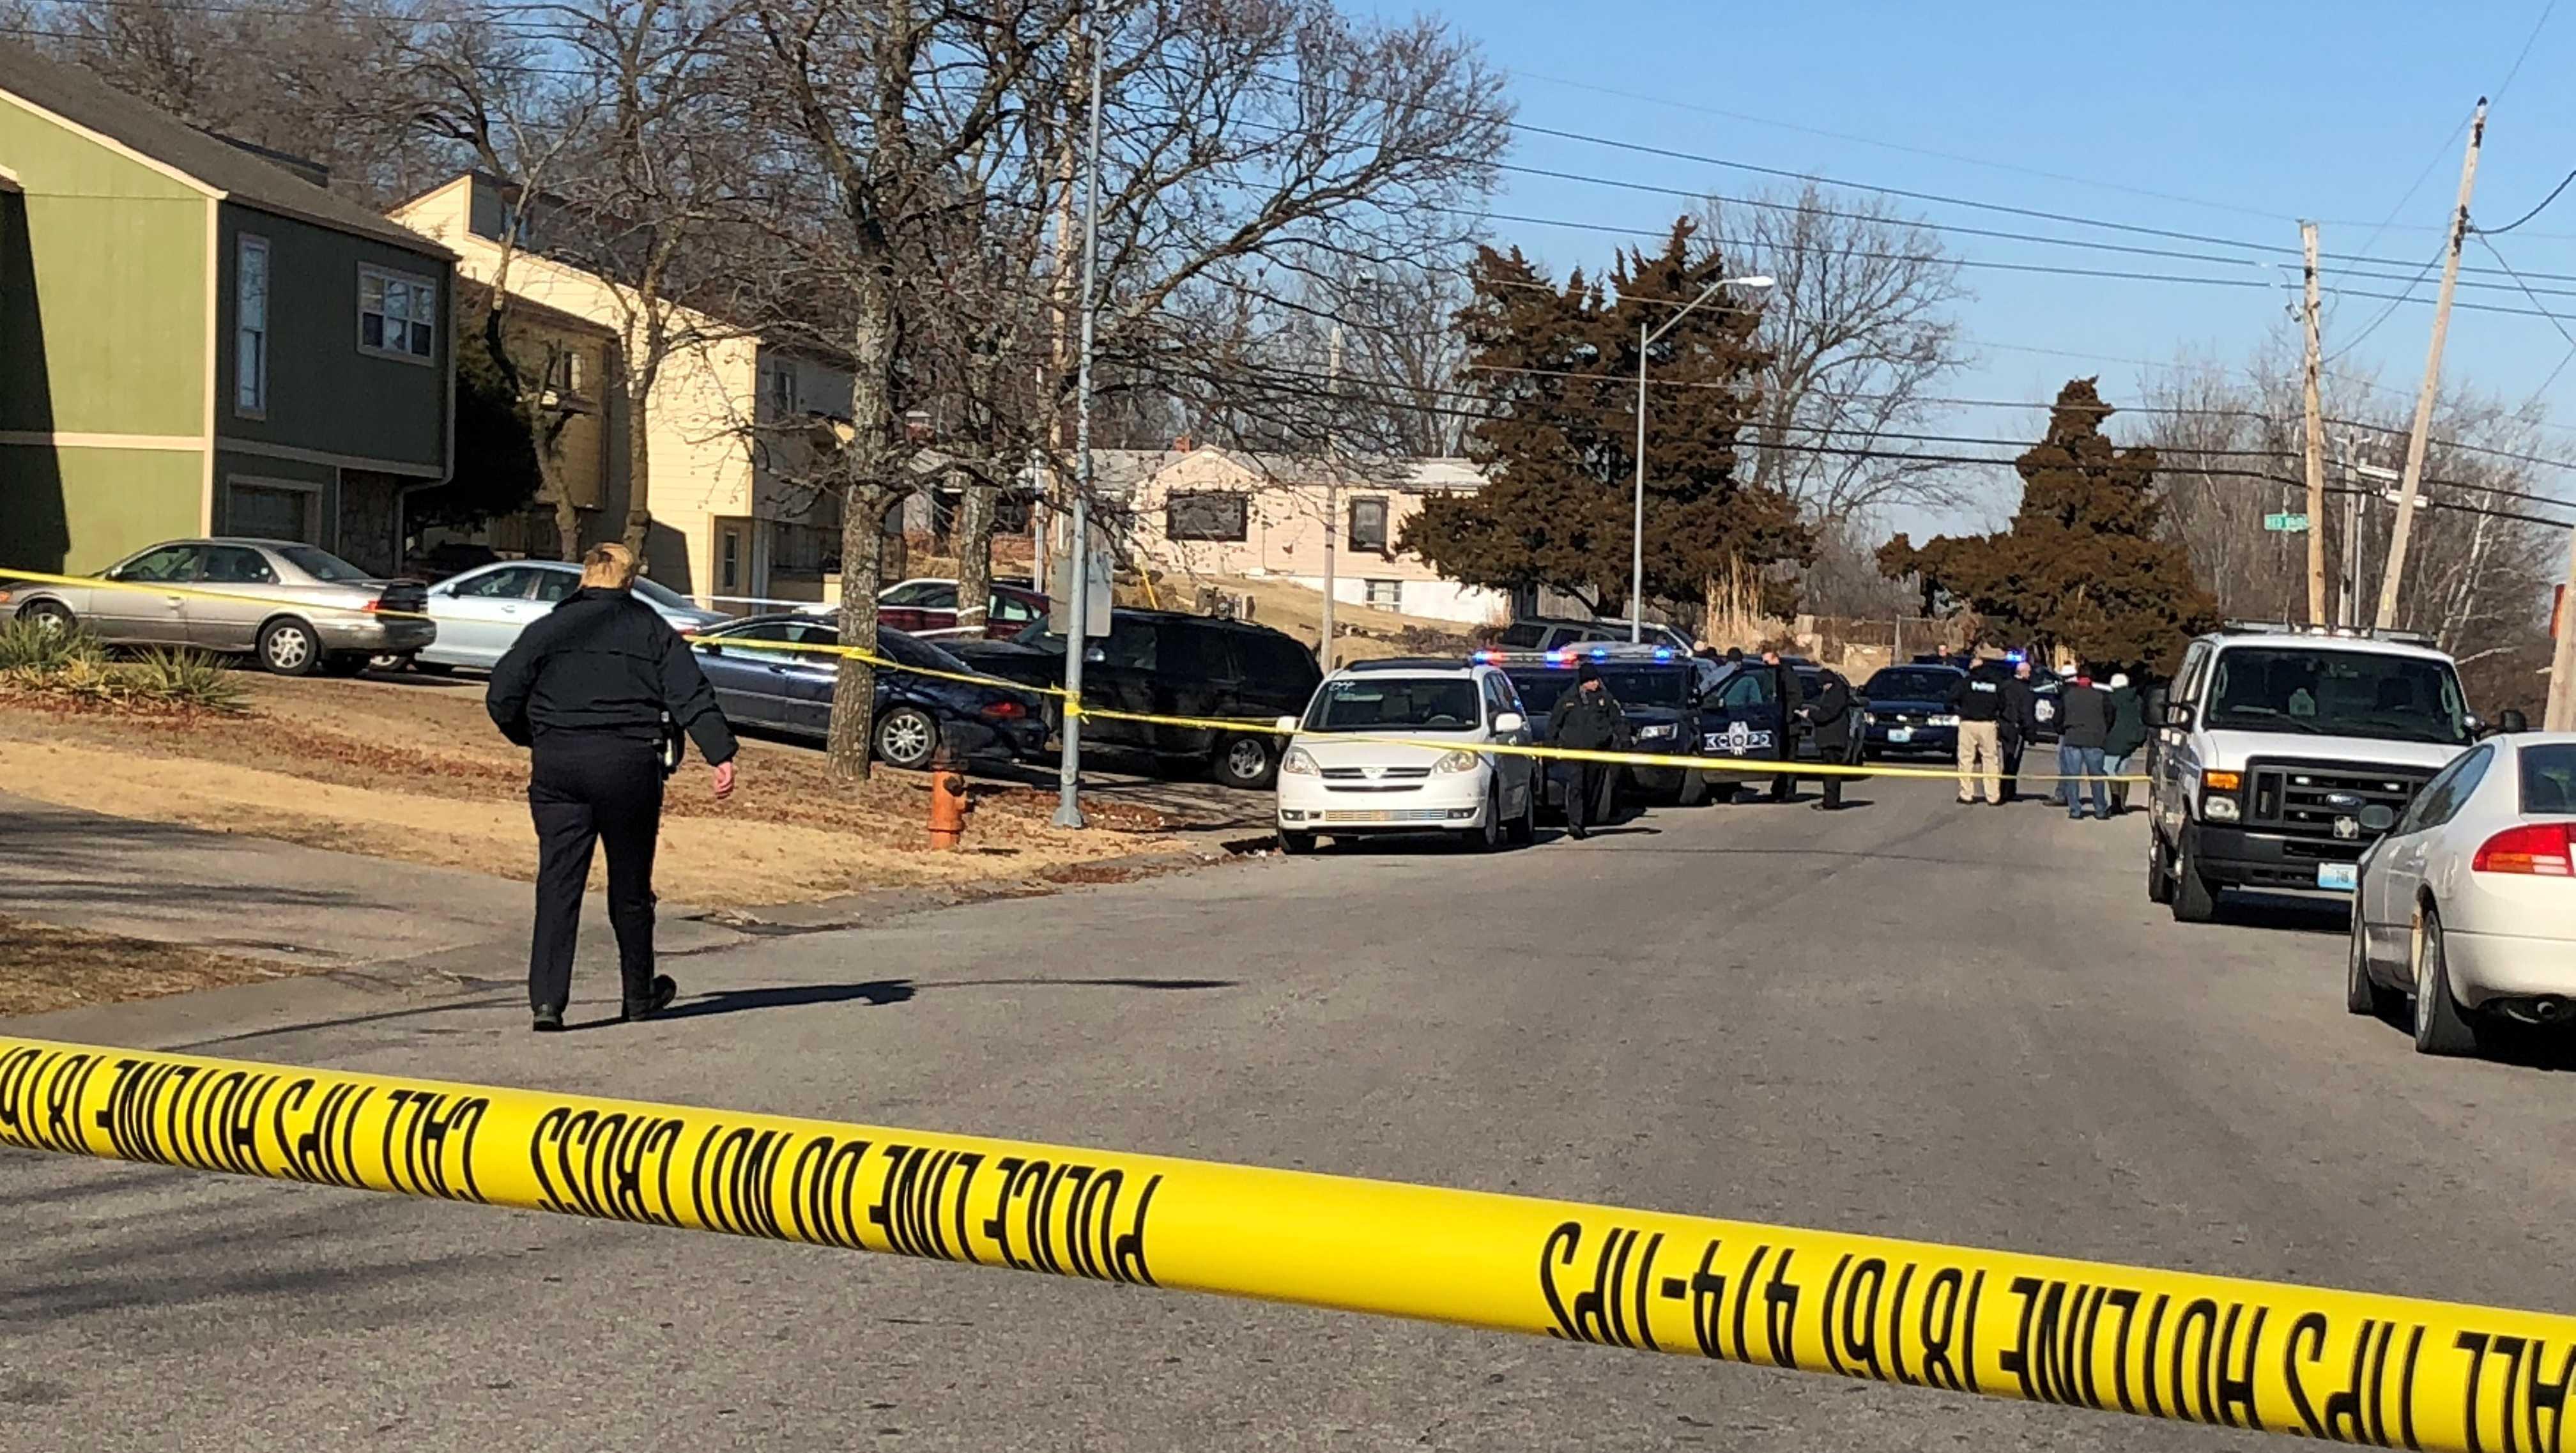 Homicide 11100 block of College Ave